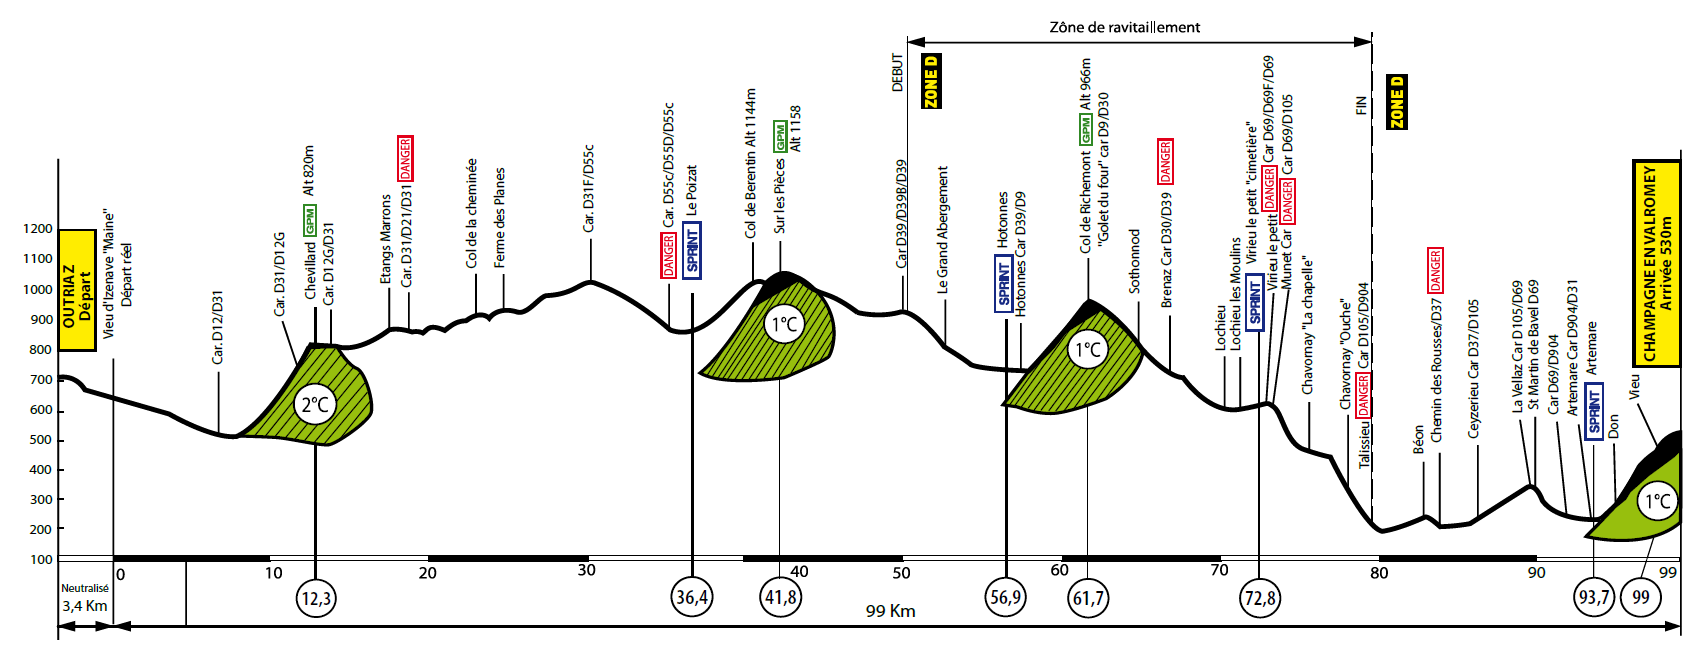 tour2017_etape2